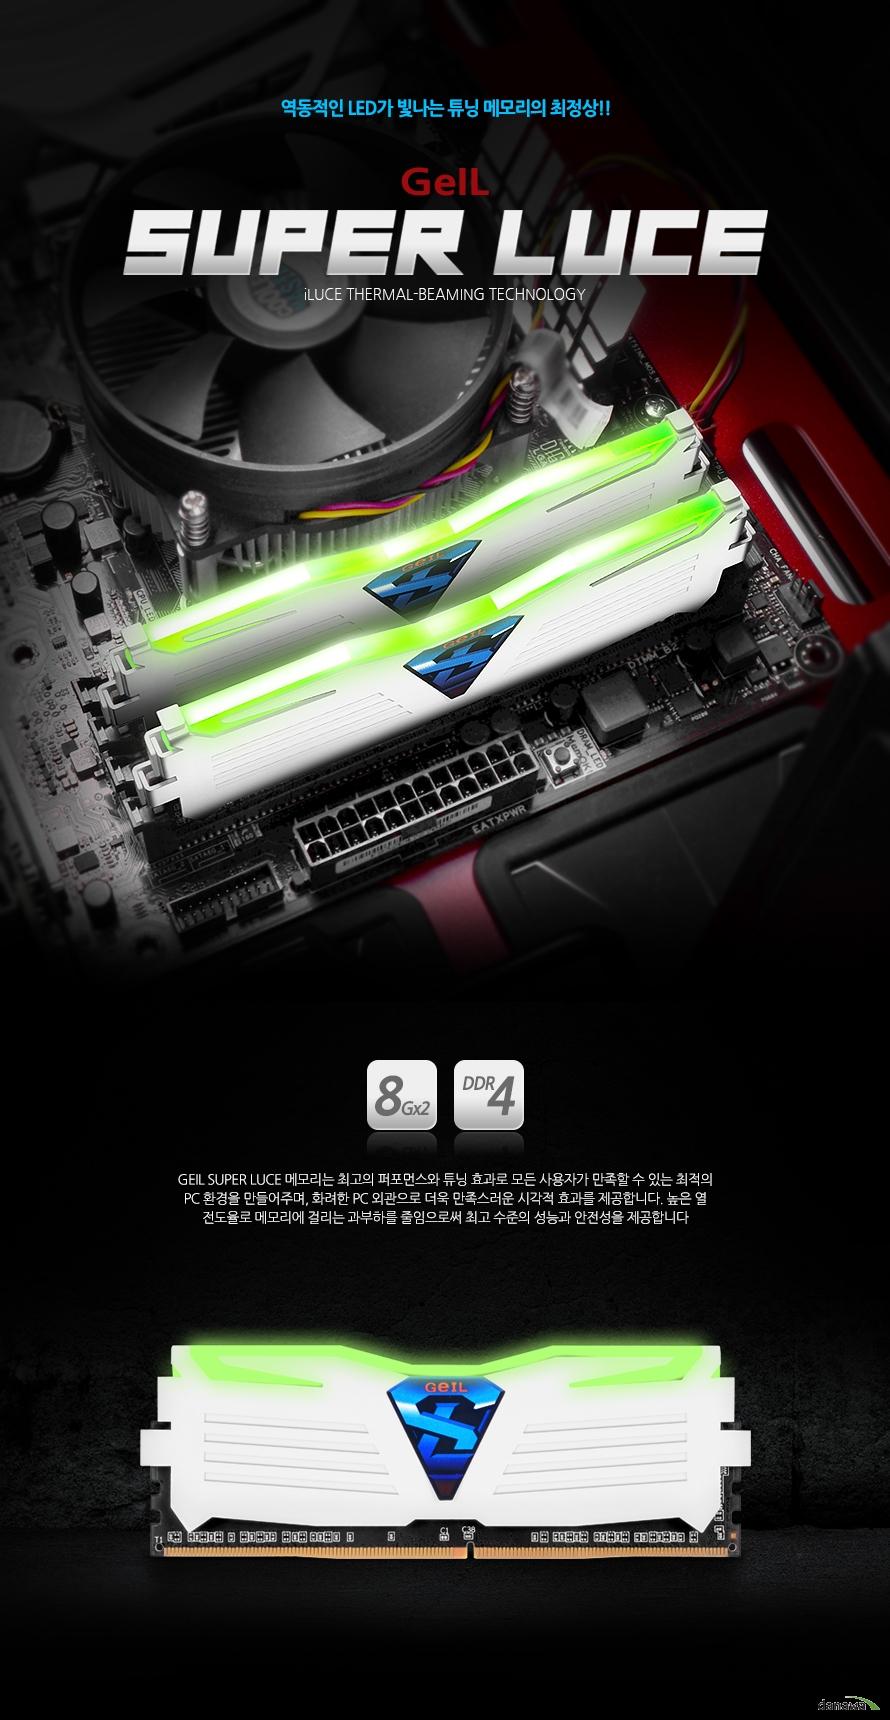 GeIL DDR4 16G PC4-24000 CL15 SUPER LUCE WHITE 그린 GEIL SUPER LUCE 메모리는 최고의 퍼포먼스와 튜닝 효과로 모든 사용자가 만족할 수 있는 최적의 PC 환경을 만들어주며, 화려한 PC 외관으로 더욱 만족스러운 시각적 효과를 제공합니다. 높은 열 전도율로 메모리에 걸리는 과부하를 줄임으로써 최고 수준의 성능과 안전성을 제공합니다